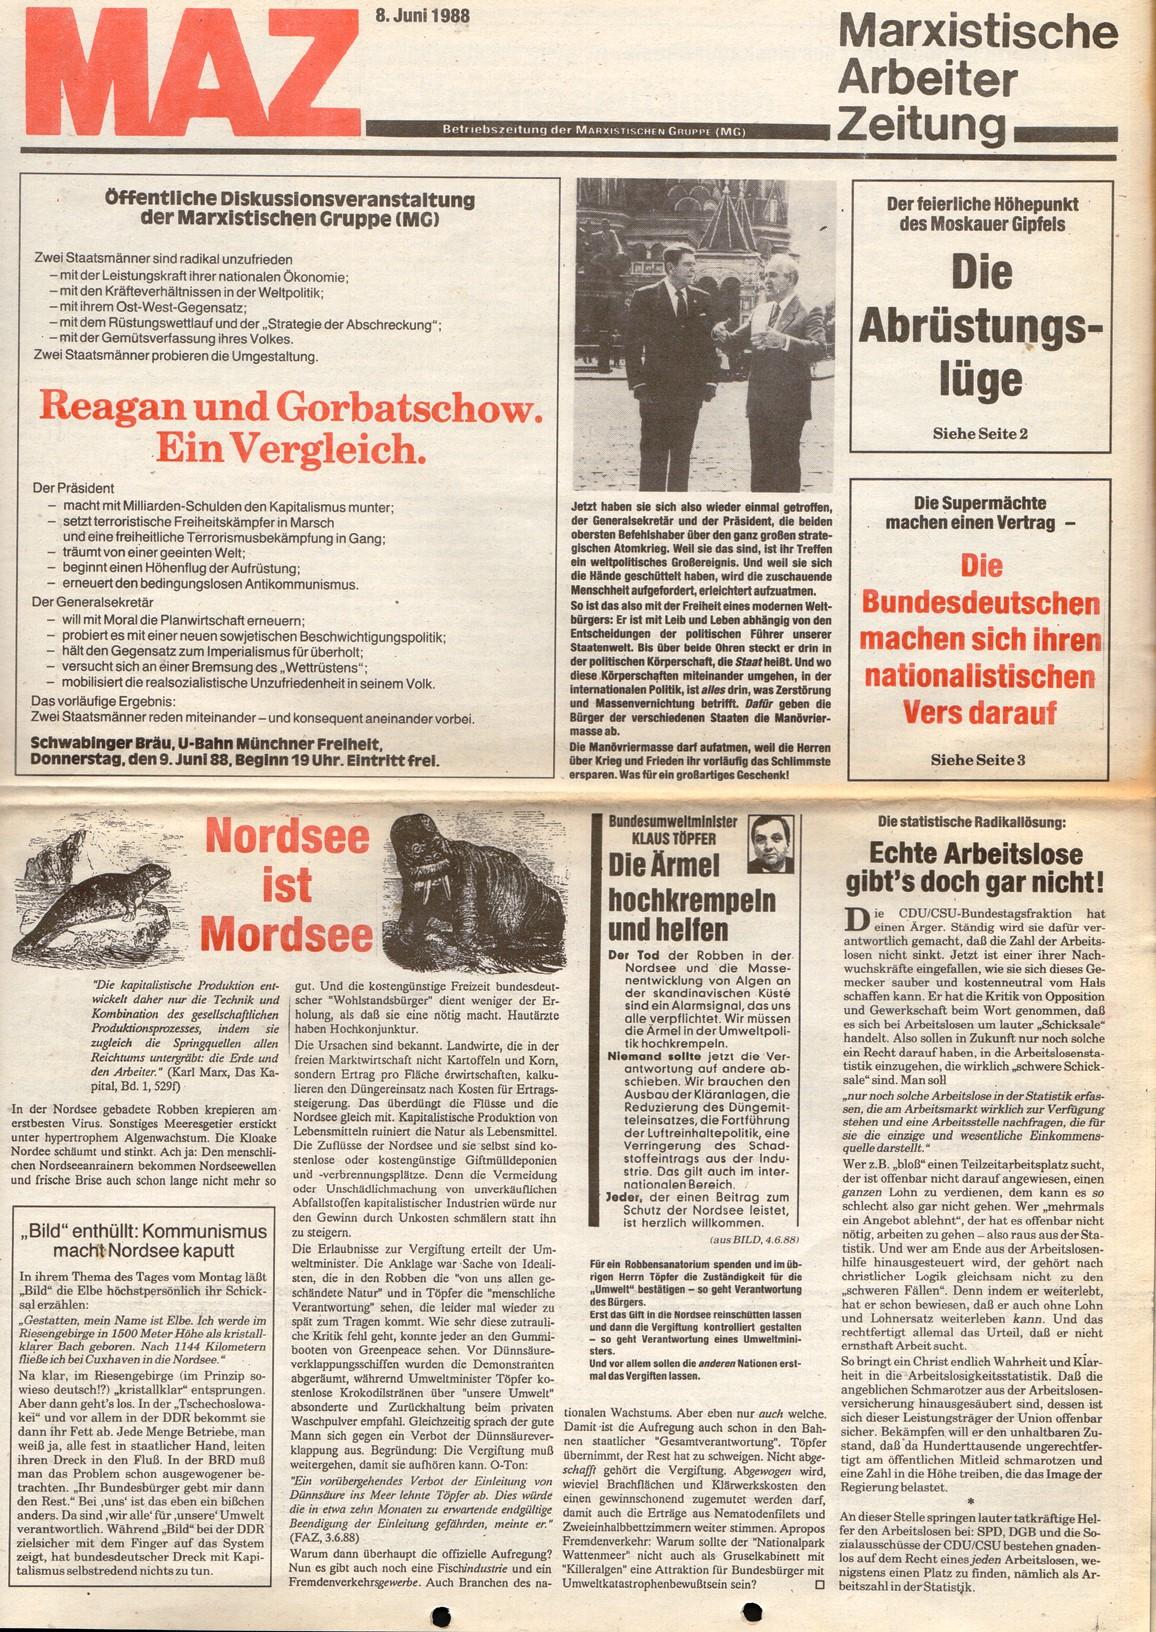 Muenchen_MG_MAZ_19880608_01